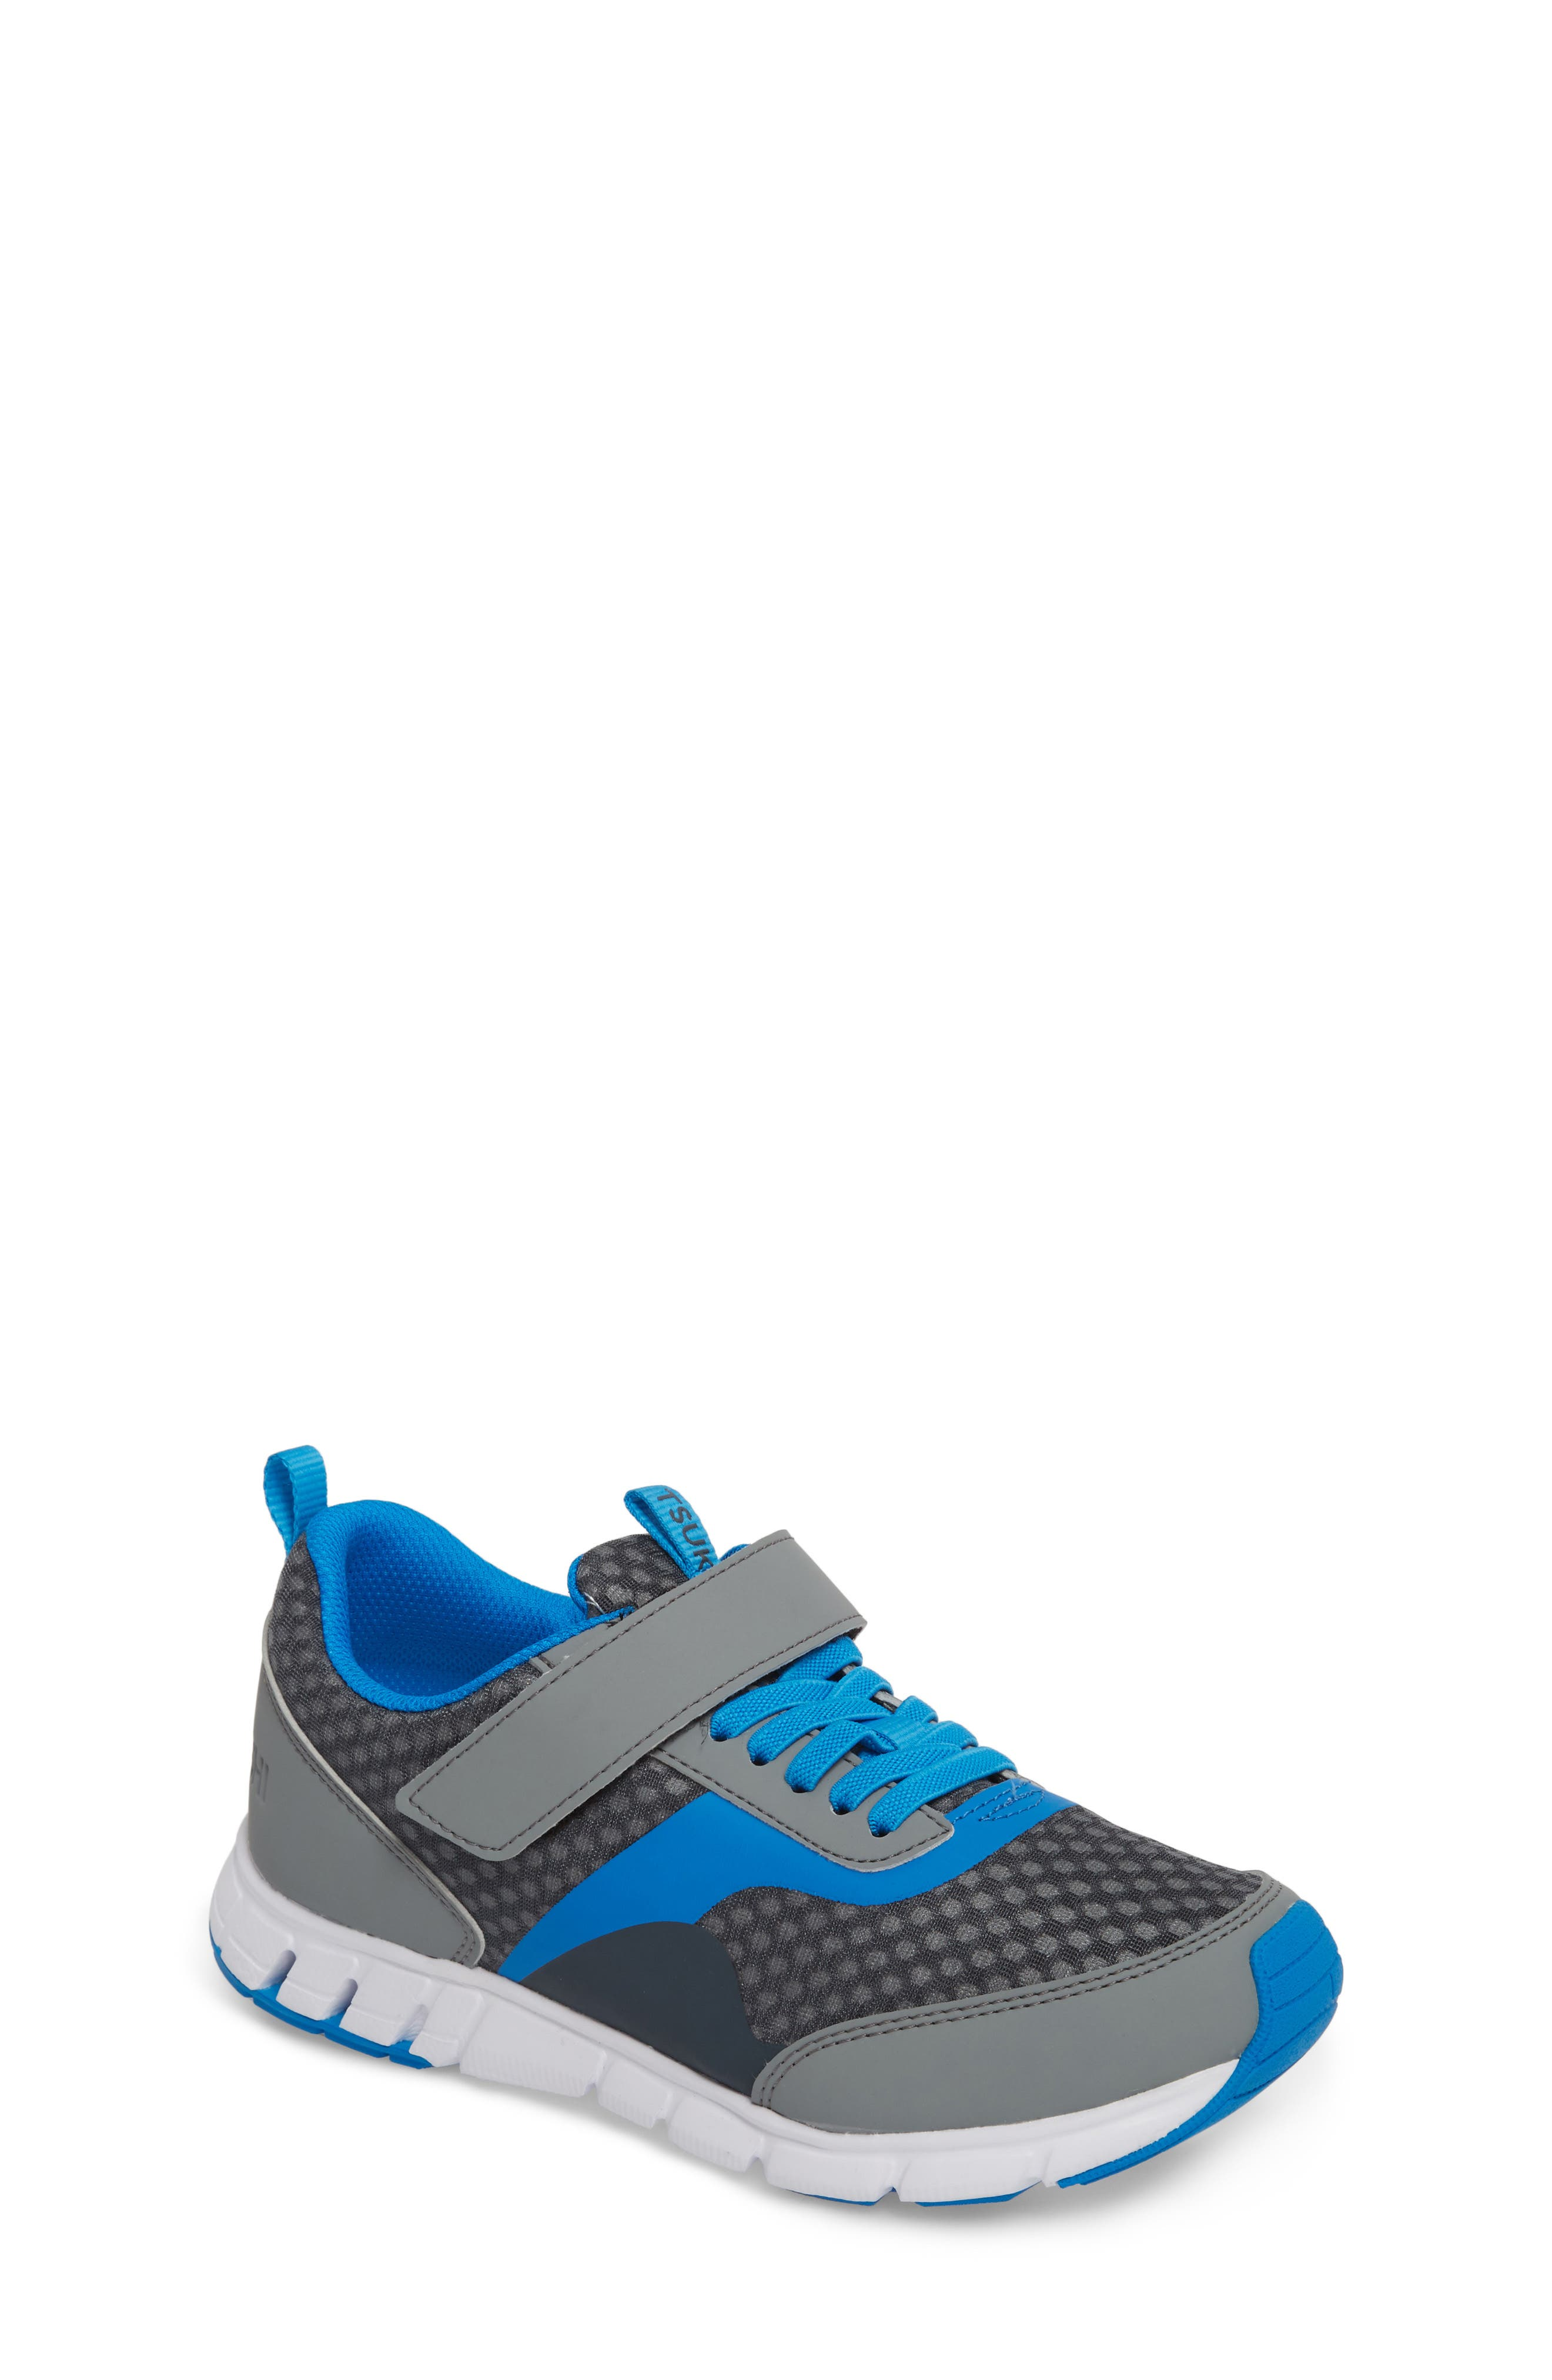 Sonic Washable Sneaker,                             Main thumbnail 1, color,                             Gray/ Royal